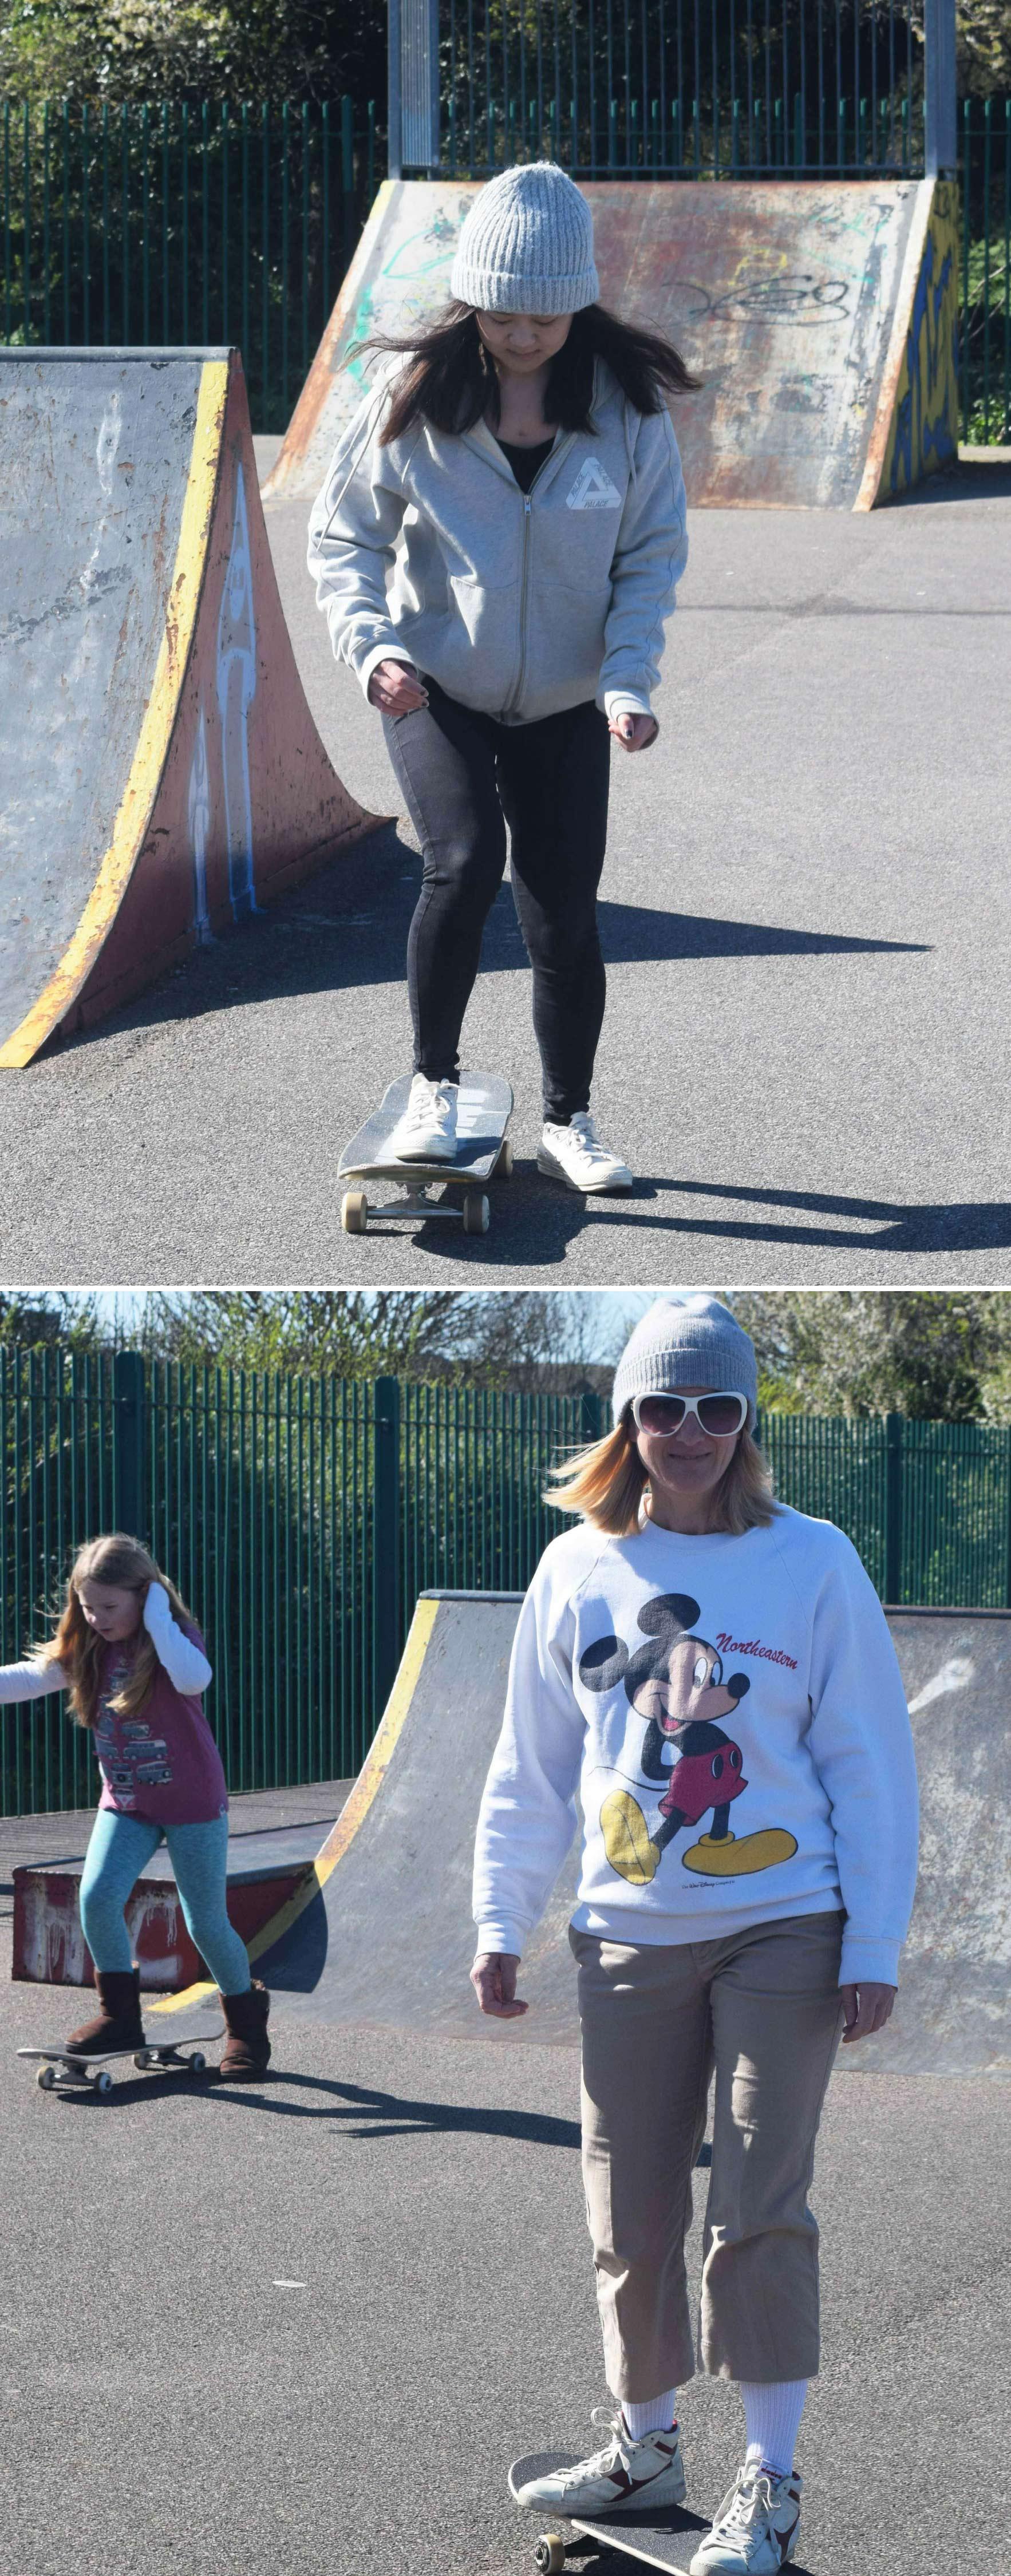 Folkestone Girl Skateboard Riders